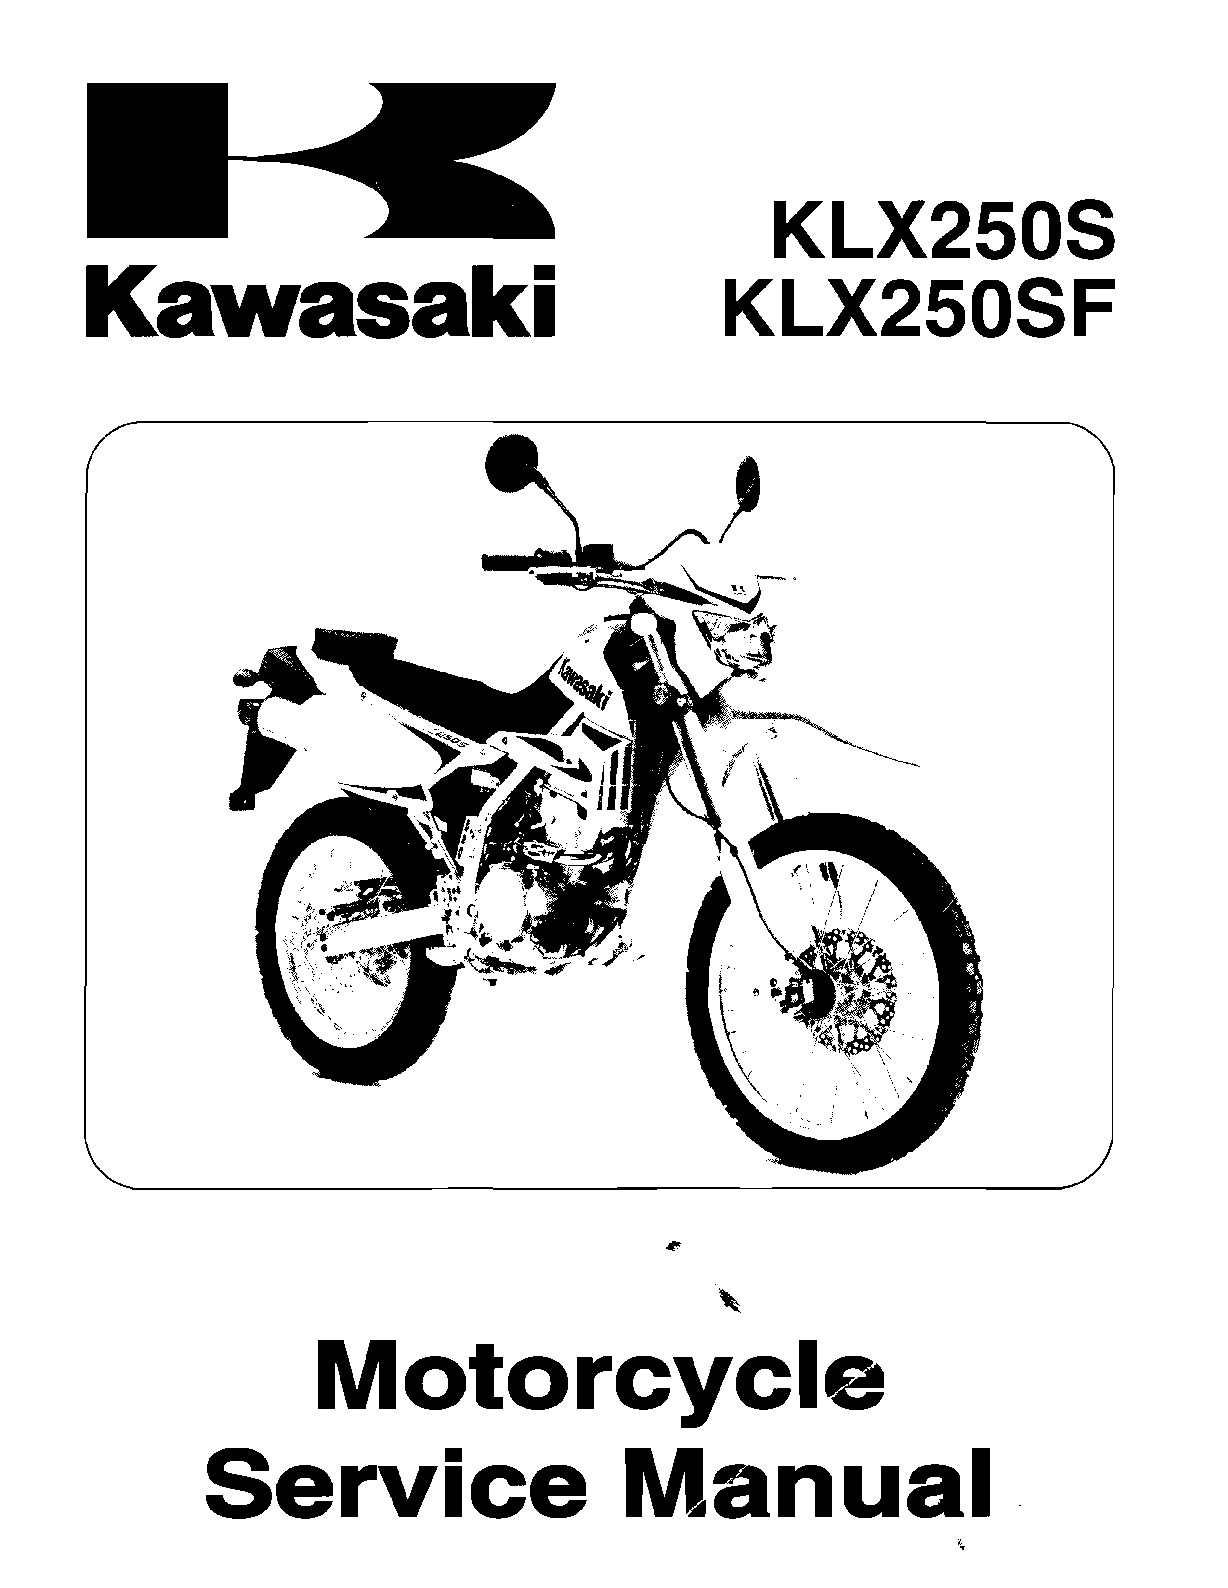 Klx 250 service manual pdf.